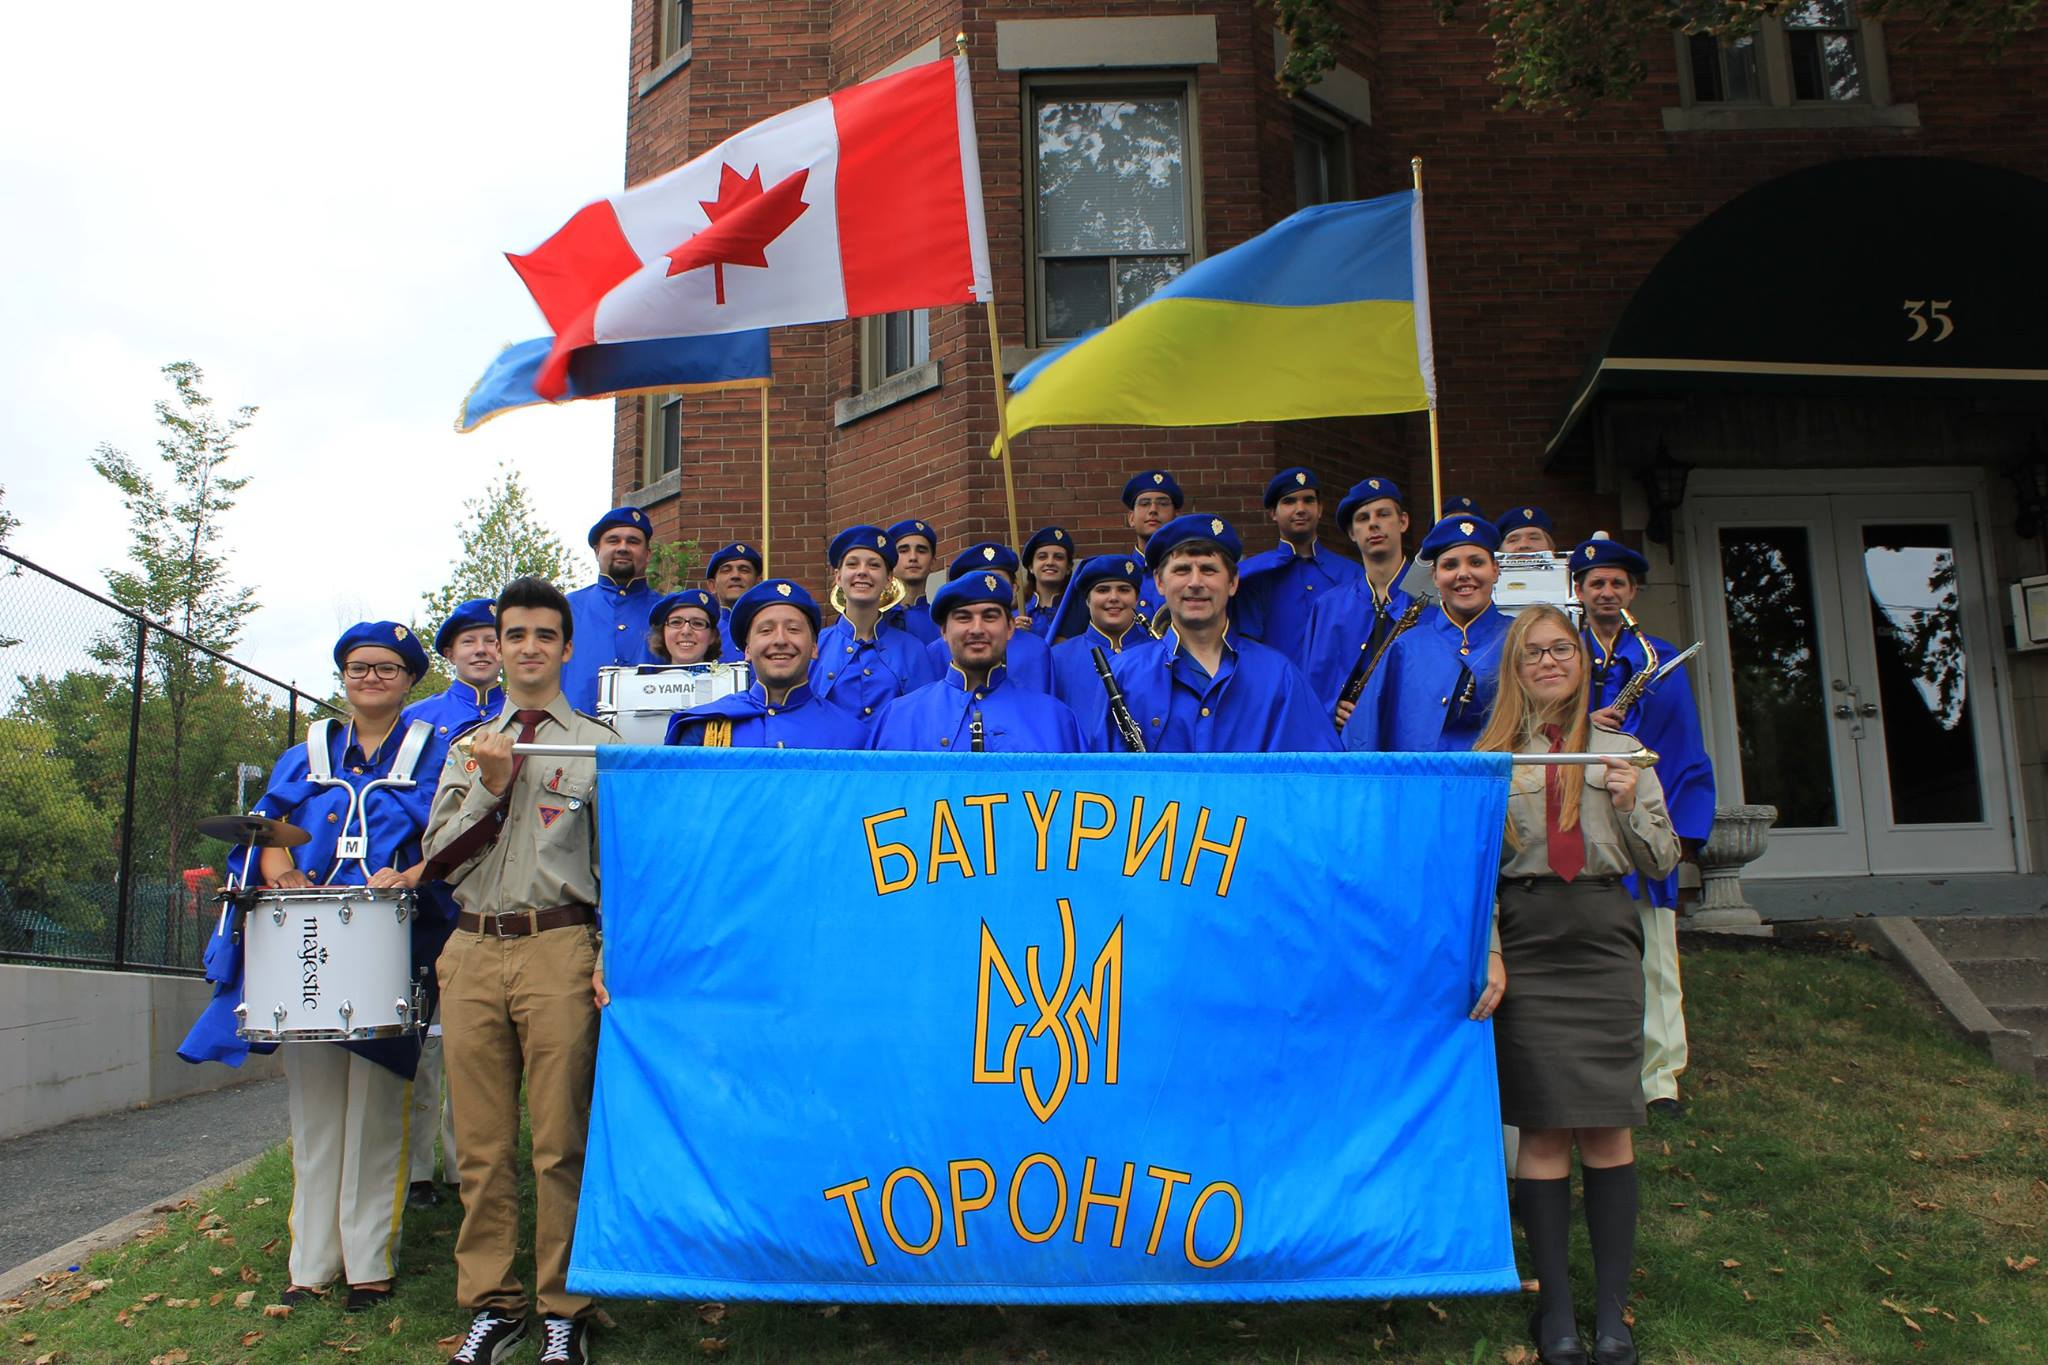 Bloor West Village Toronto Ukrainian Festival - Sep 19, 2015